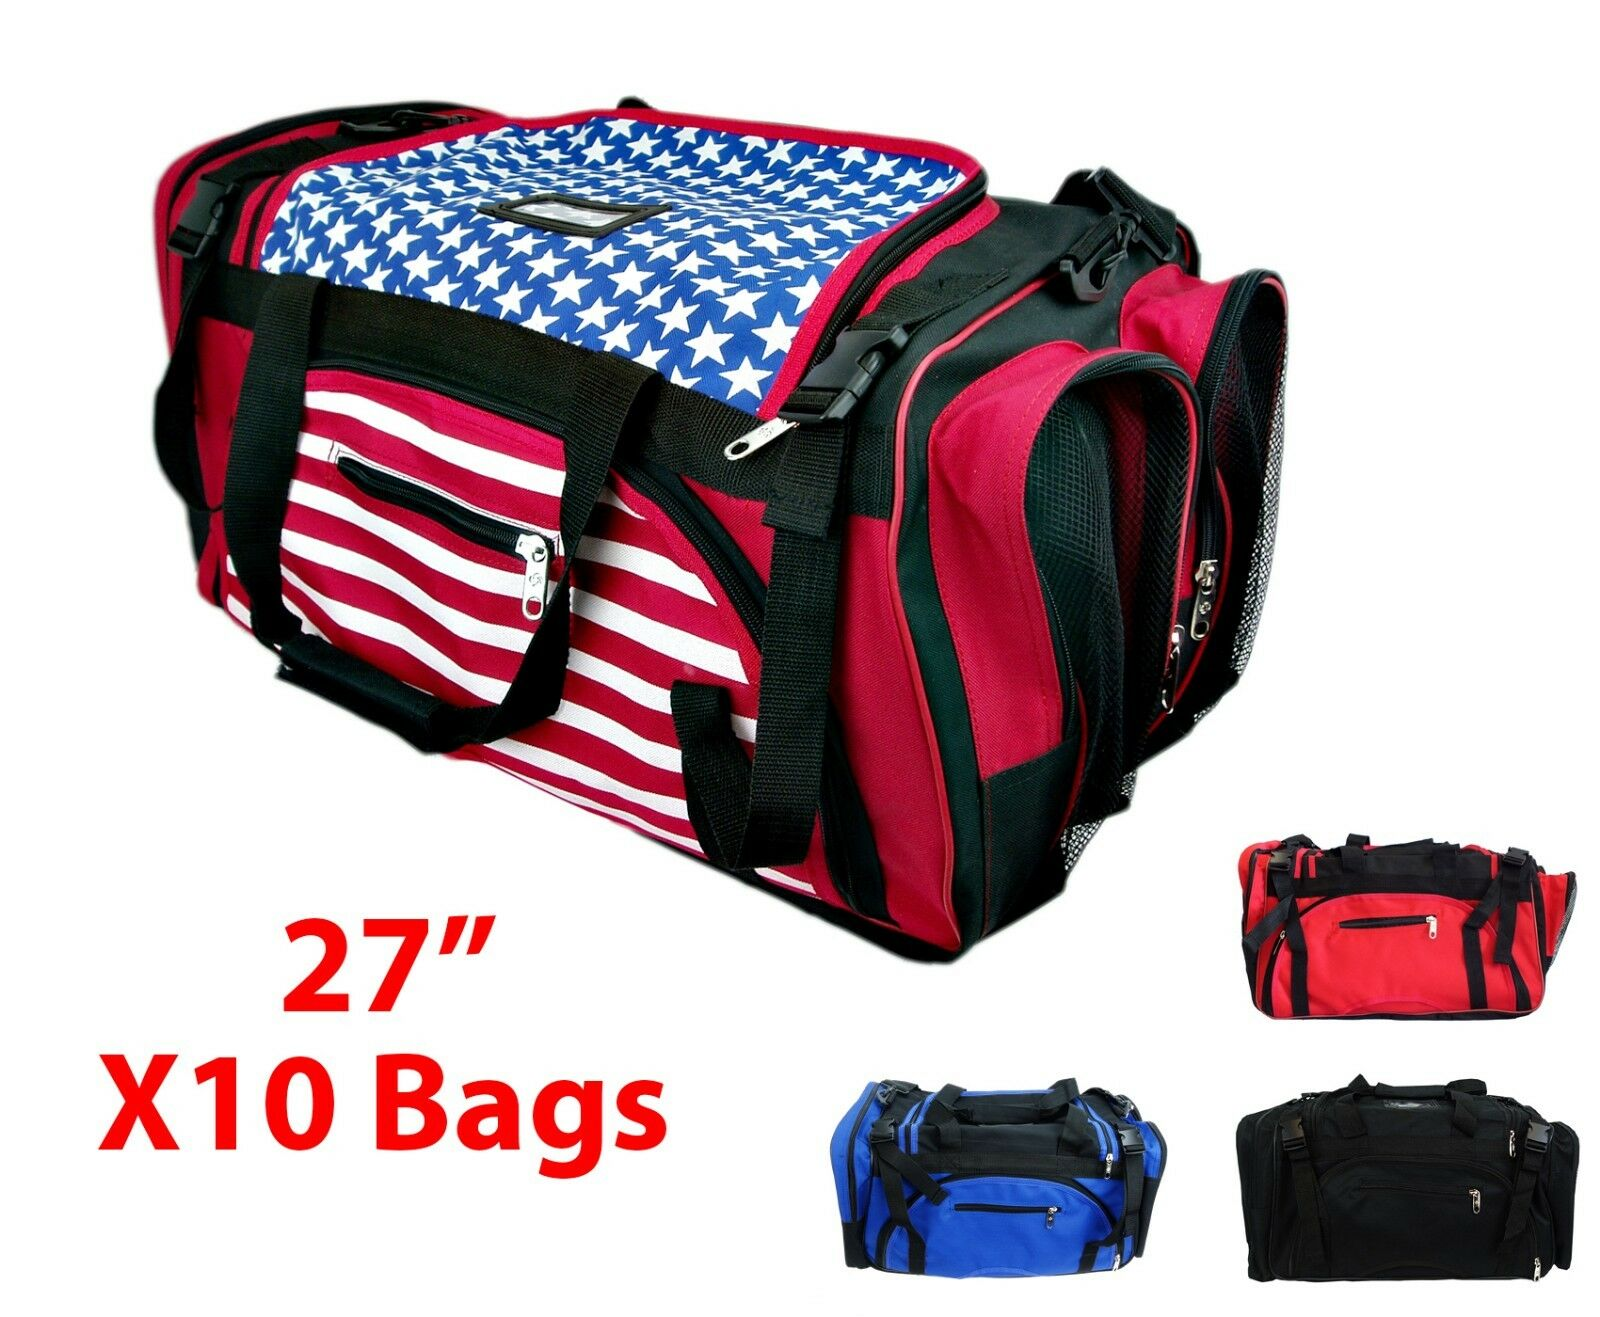 X10 Equipment Gear Bag Taekwondo Karate  MMA Martial Art Deluxe 27  Travel Bag  happy shopping